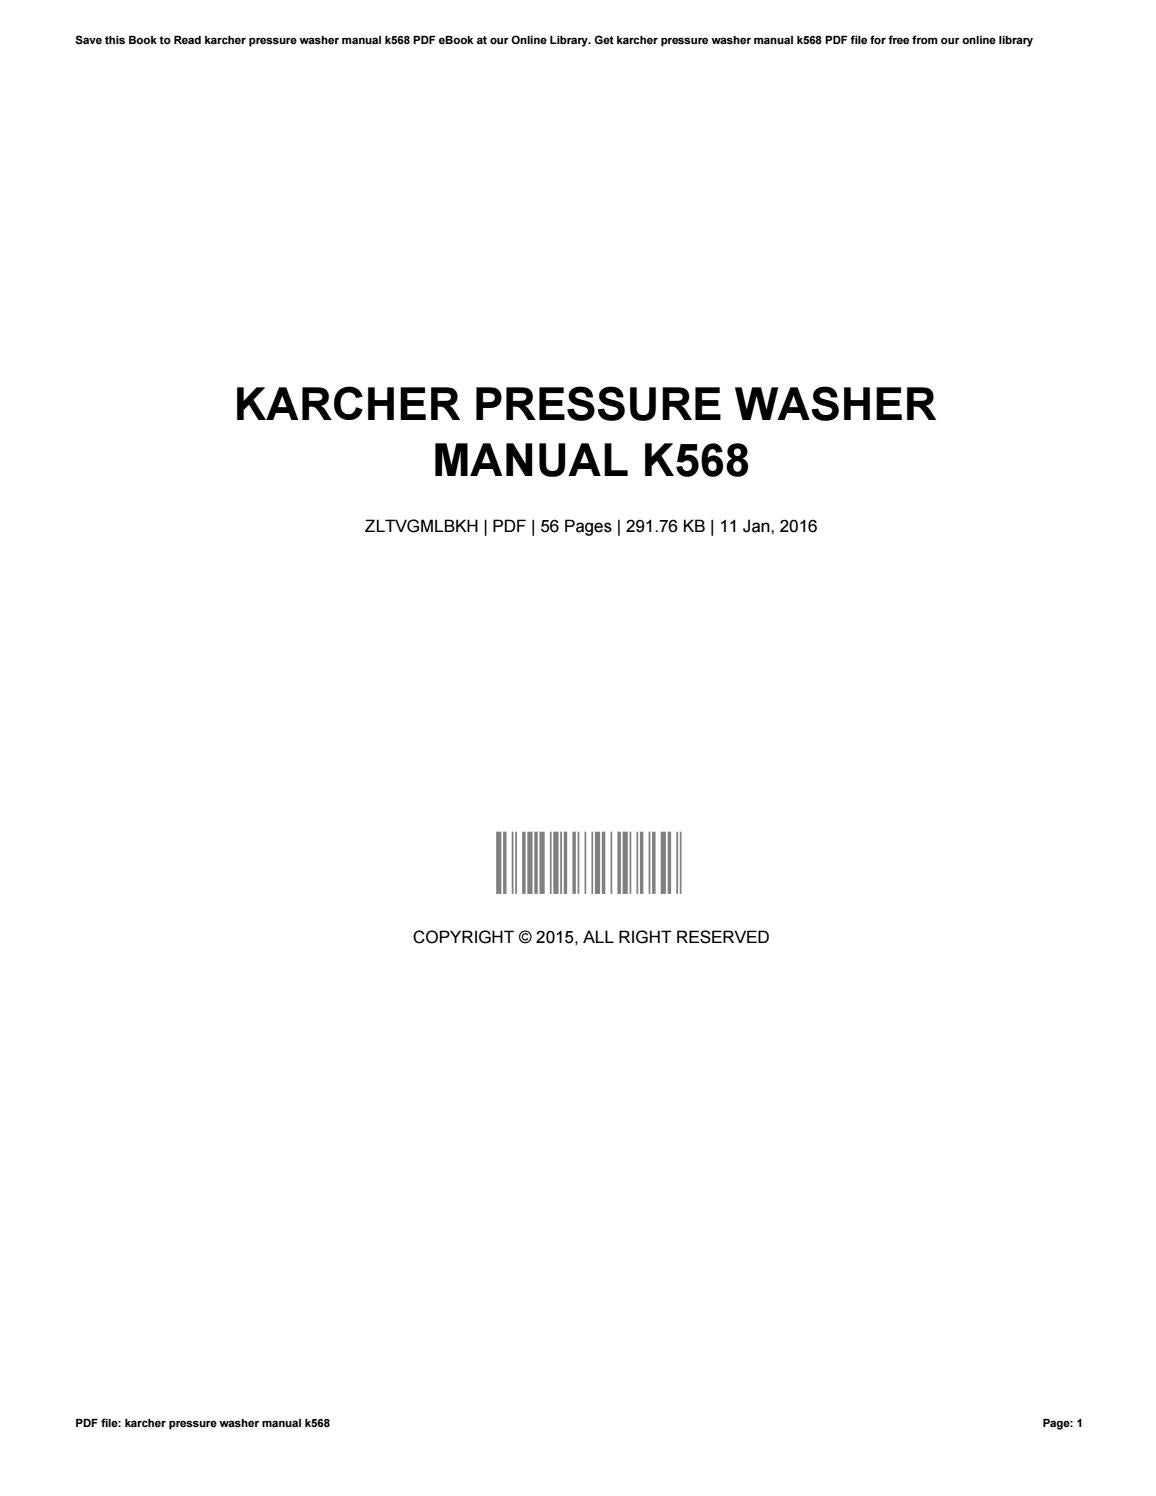 Karcher pressure washer manual k568 by RobertHendrickson4715